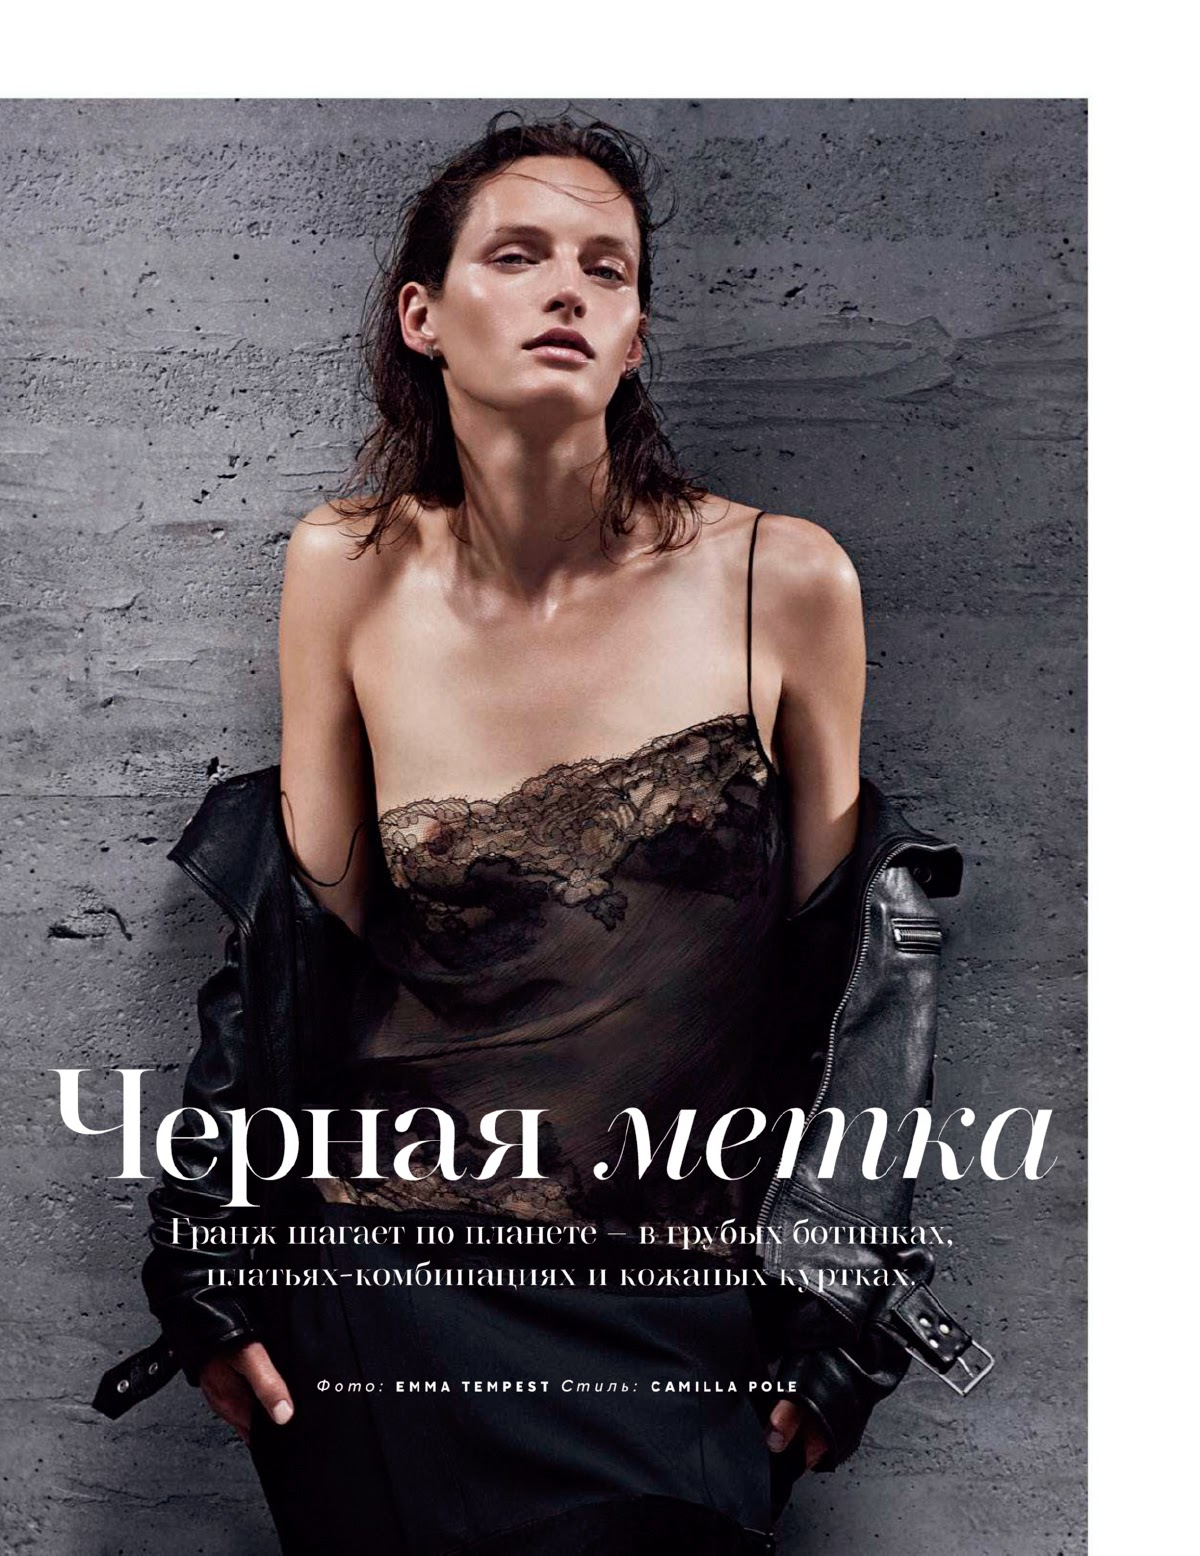 Hot Vivien Solari nude (39 photos), Topless, Cleavage, Boobs, cleavage 2019